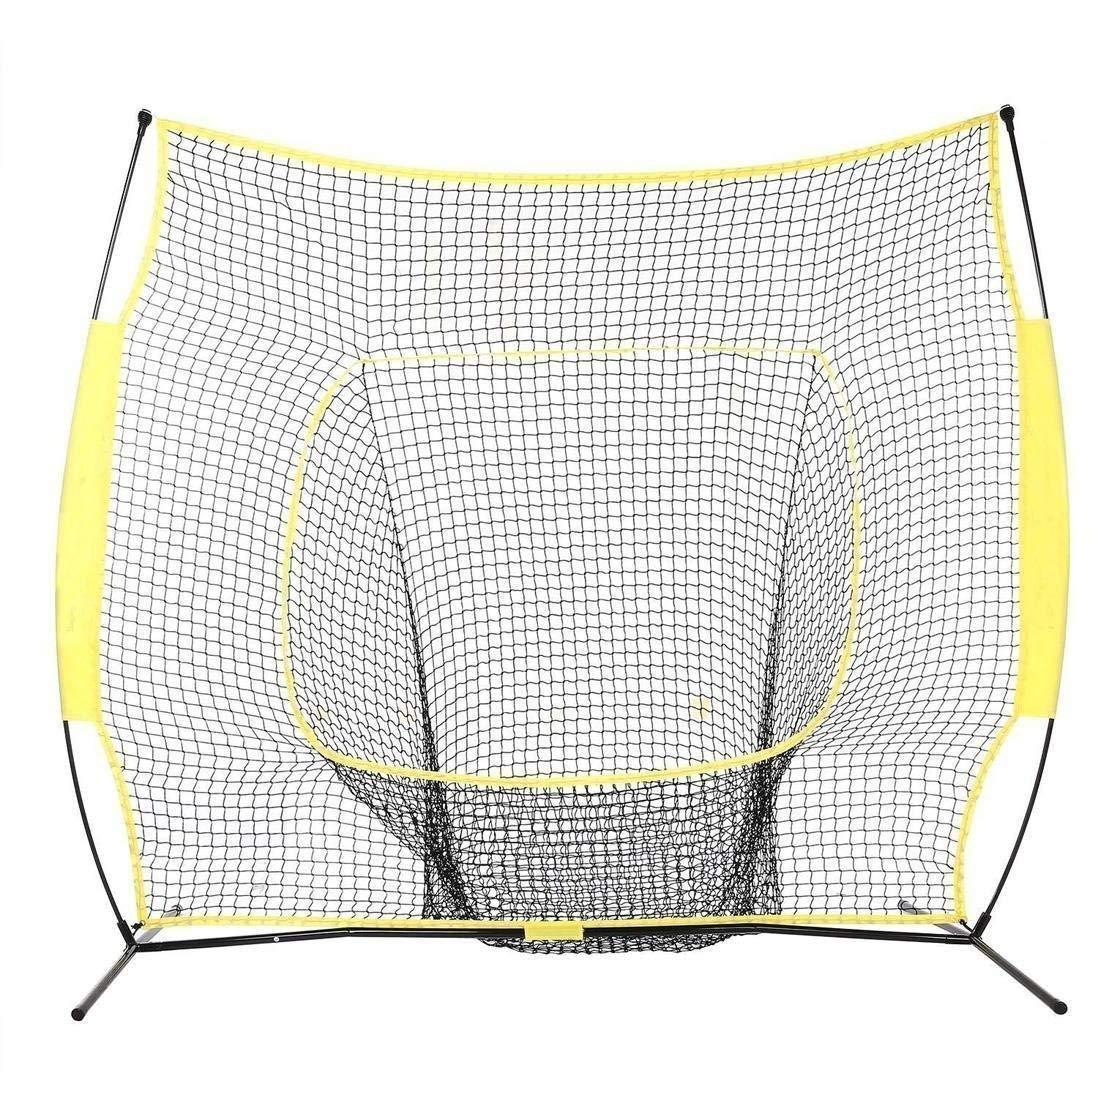 Mewalker 7 x 7ft Baseball Softball Practice Net, Professional Portable Baseball Hitting Pitching Batting Training Net with Carry Bag (US STOCK)